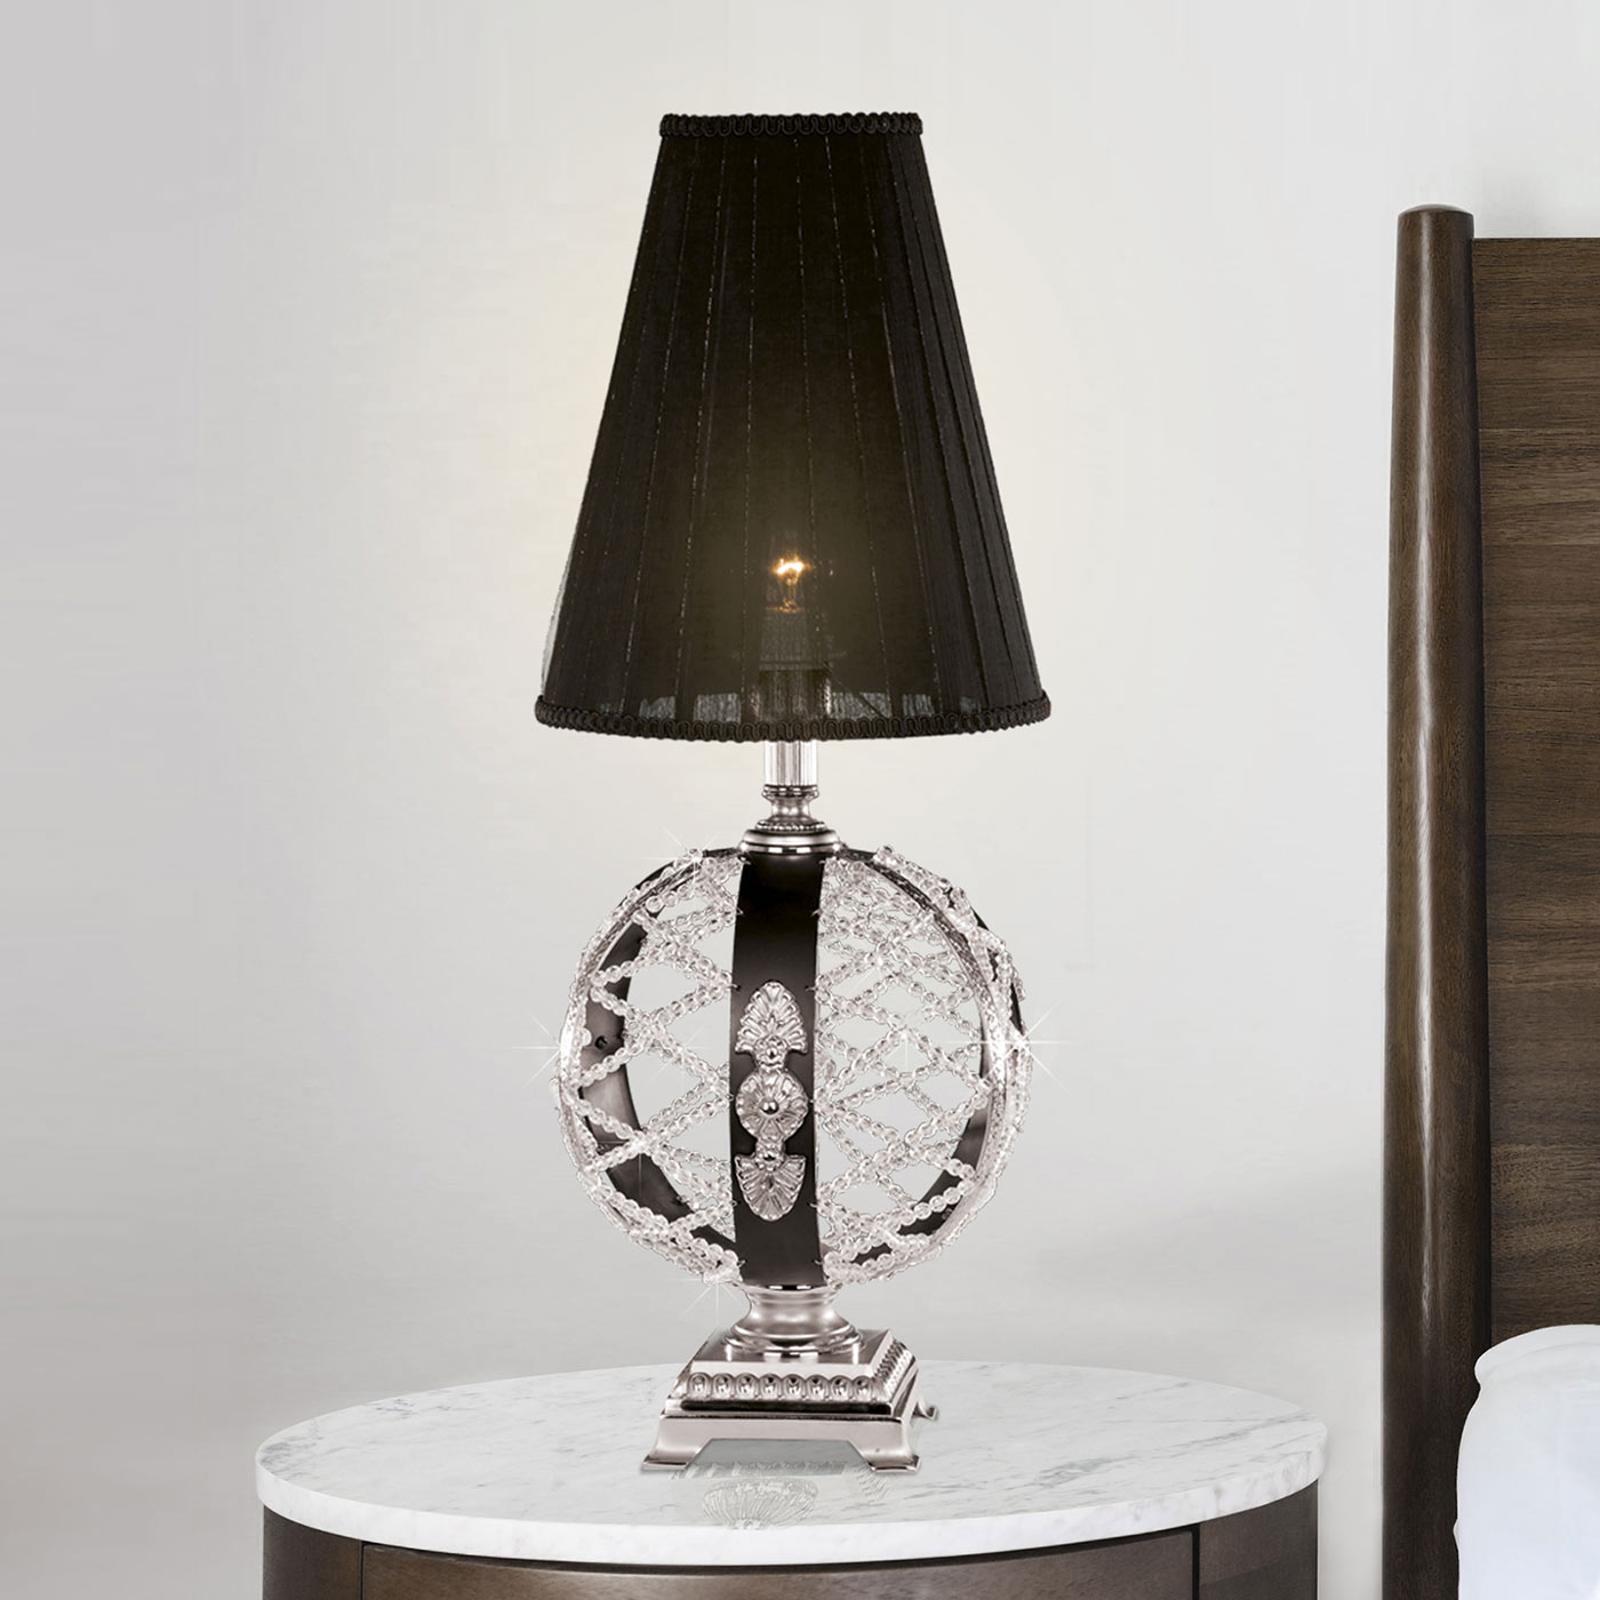 Tafellamp Arianna, zwart, nikkel mat, kristal